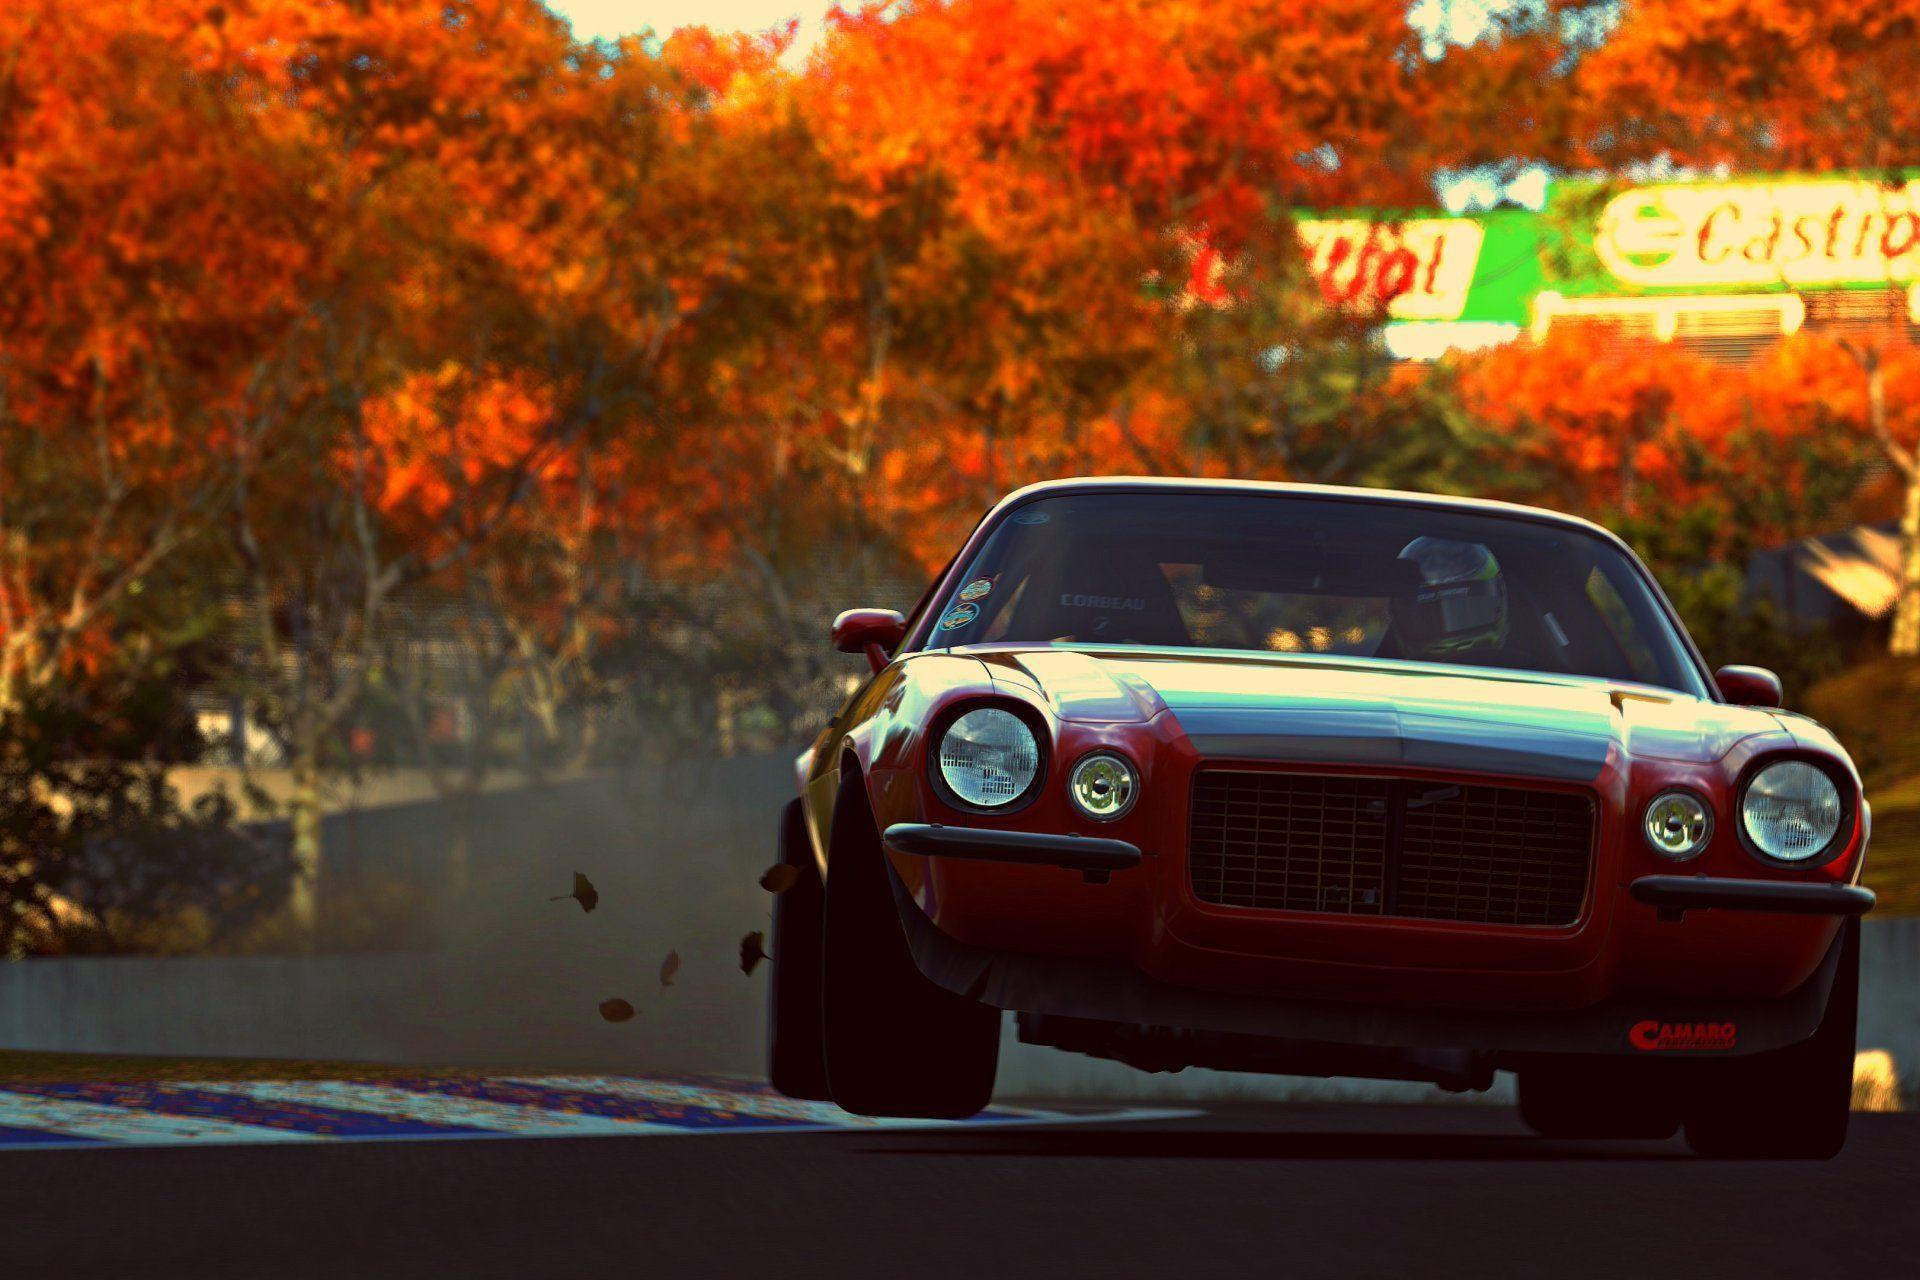 Best Hd 1080p Car Wallpaper Pozzi Motorsports Camaro Rs Car Muscle